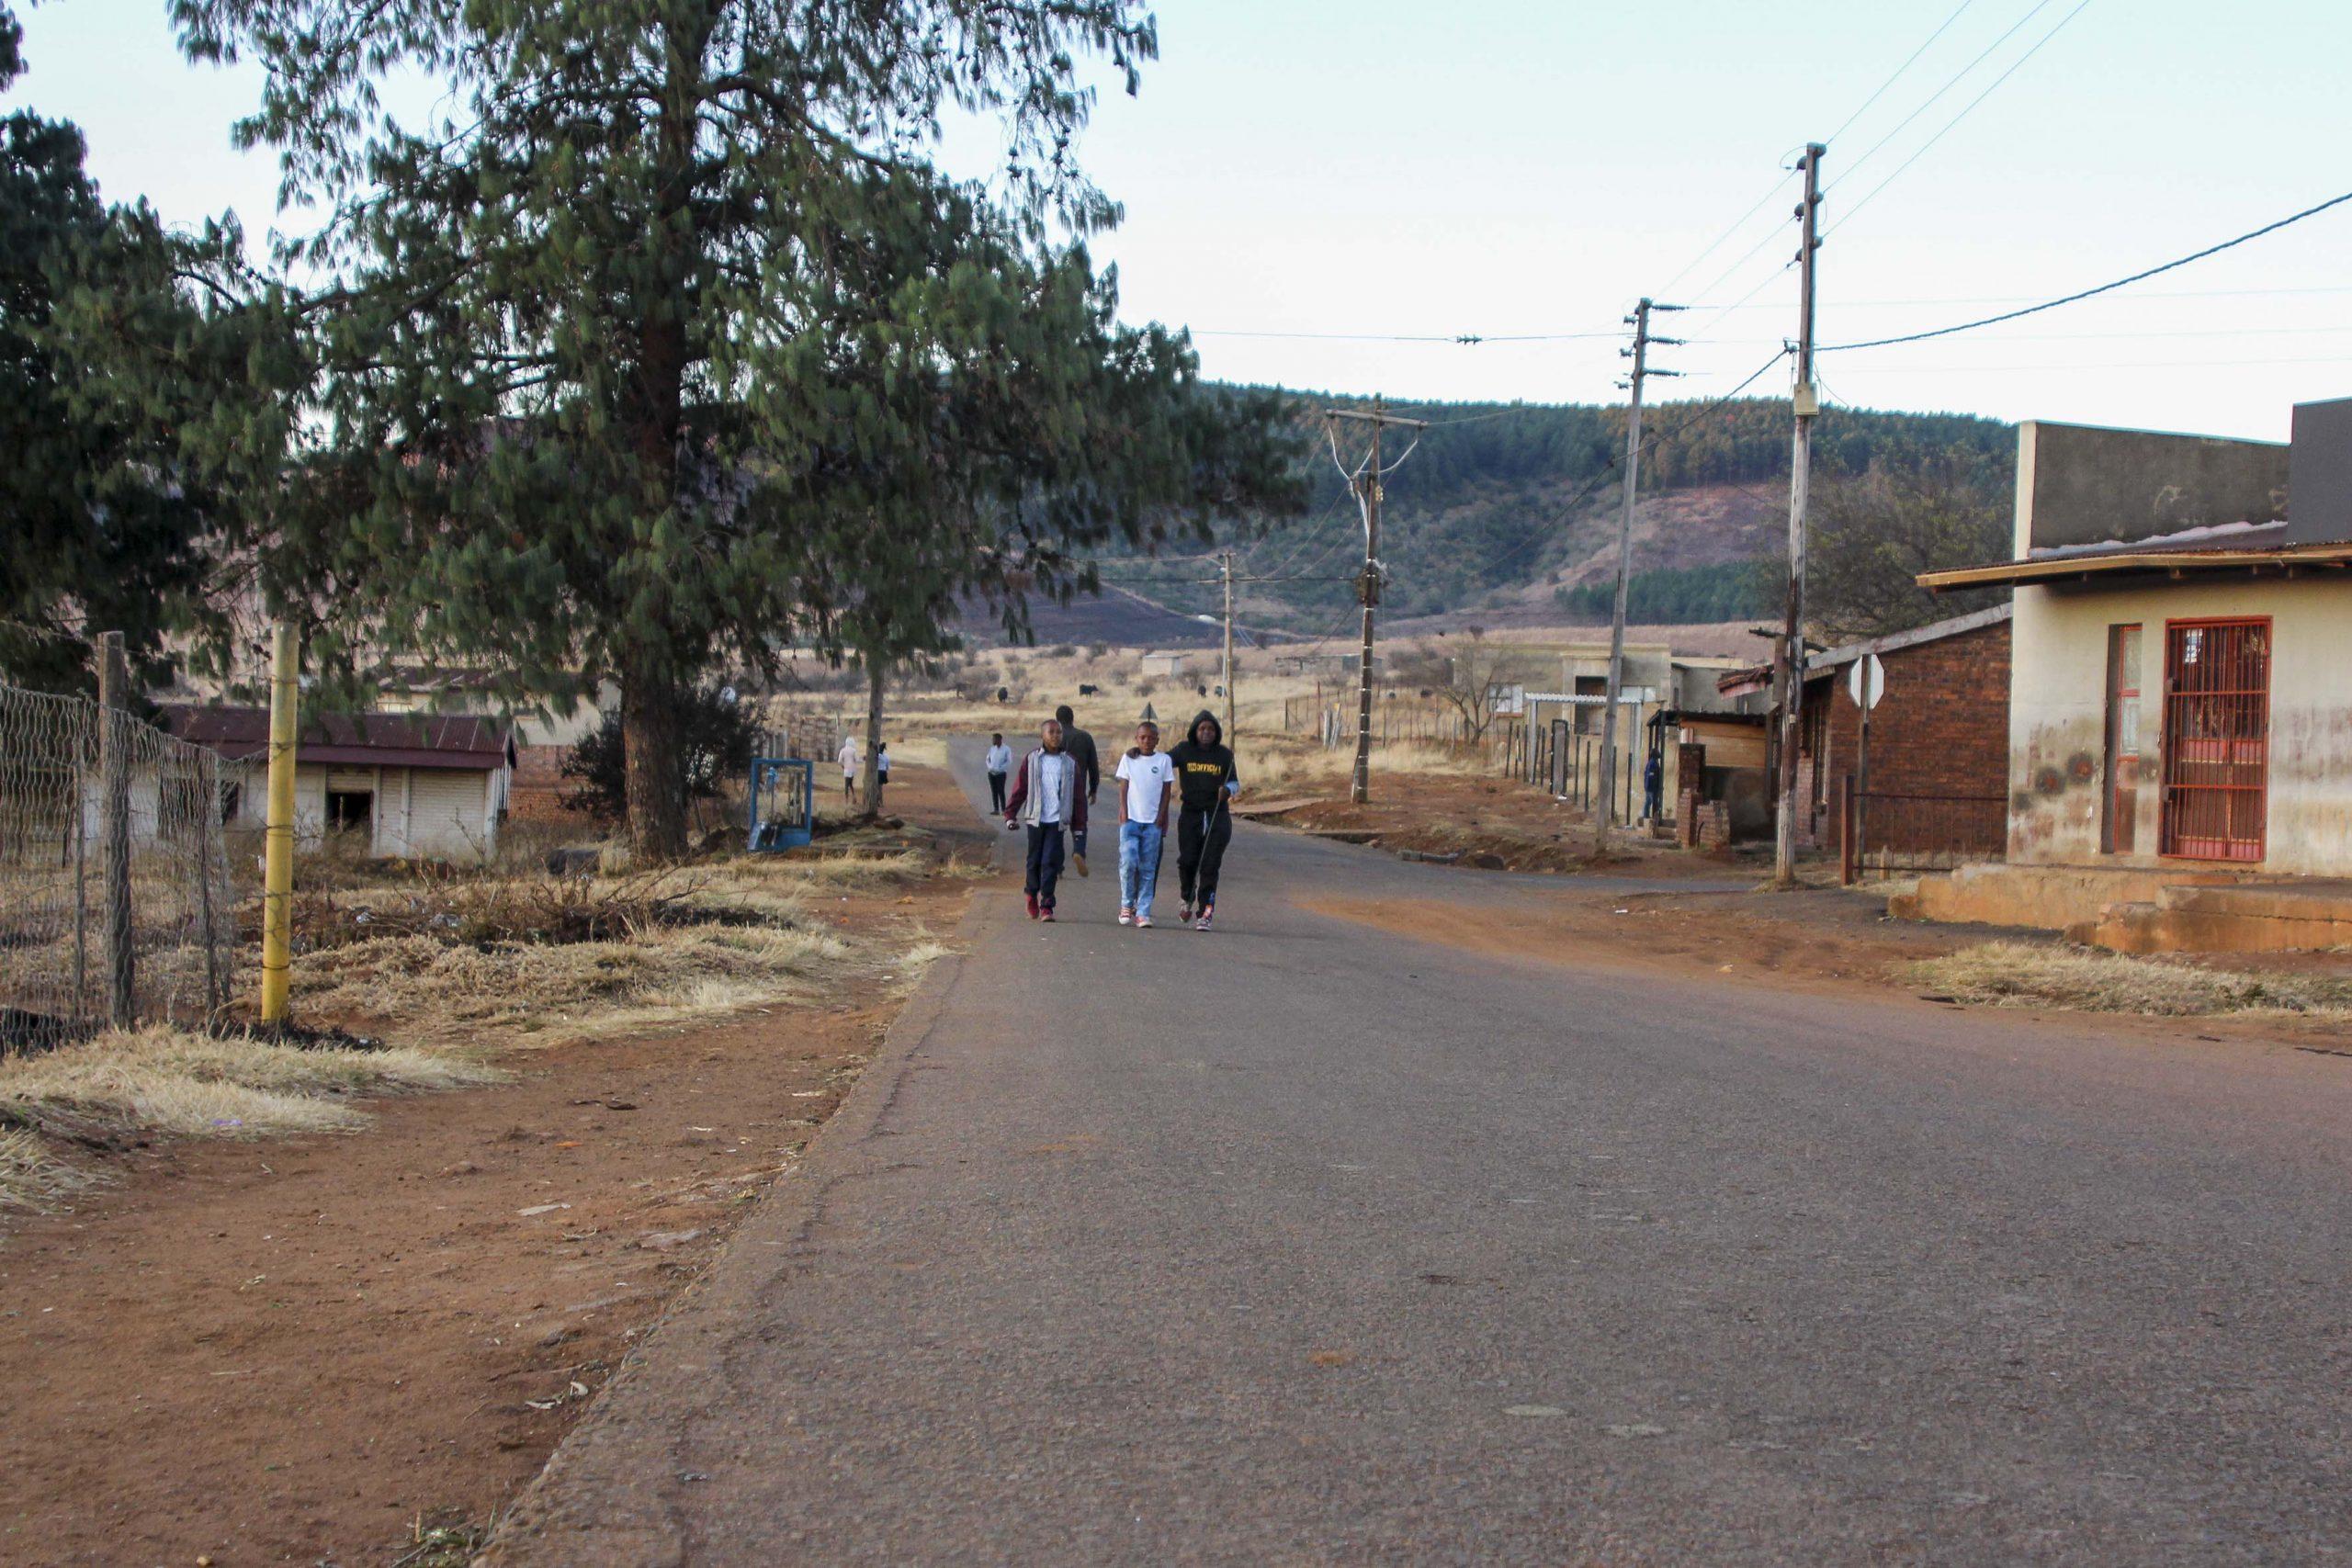 28 June 2020: The road in KwaThandeka where Kwanele Khumalo was injured after police randomly shot at him and other protestors.